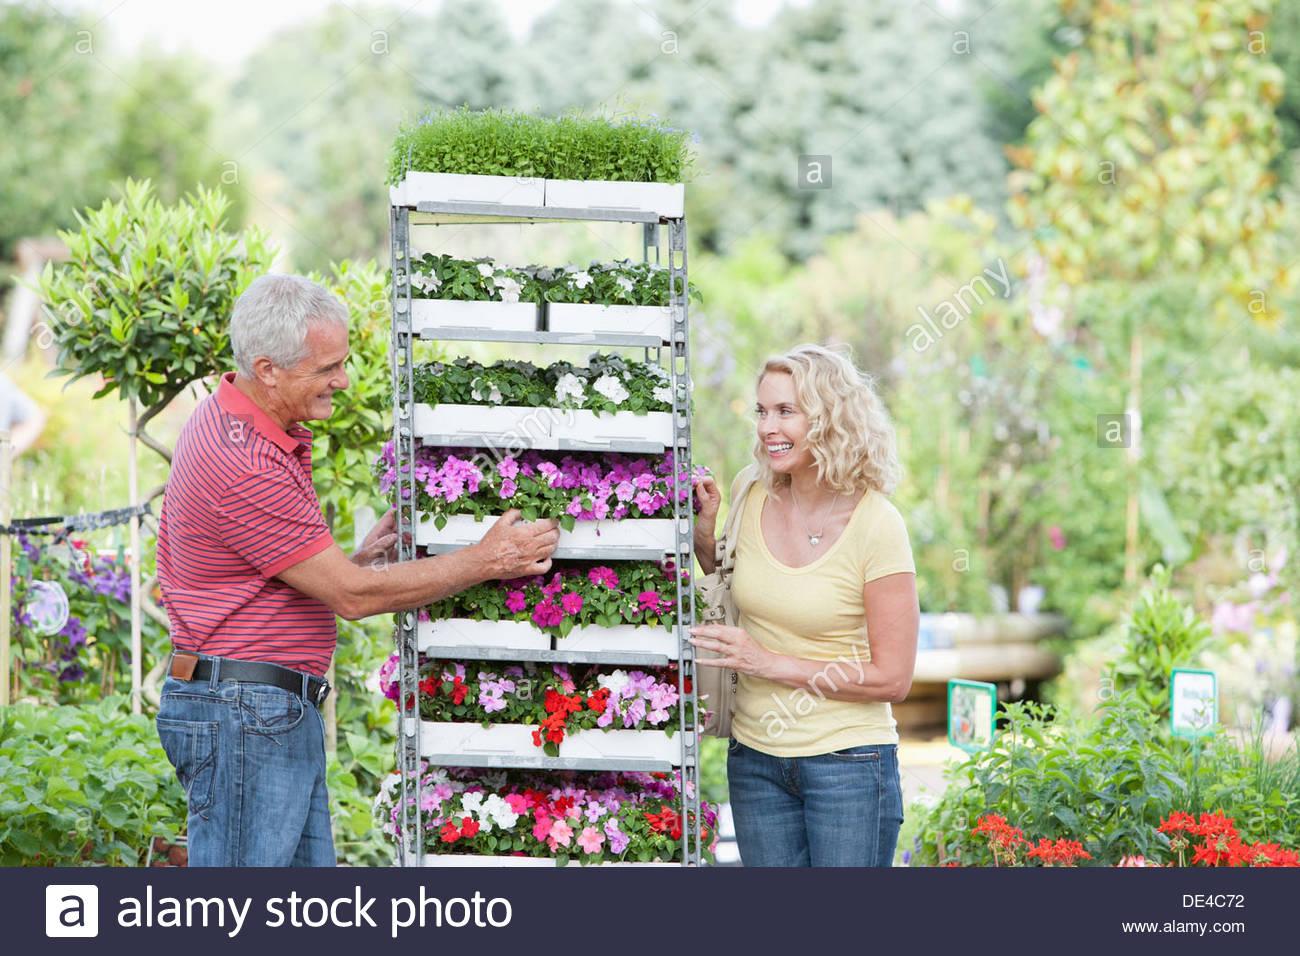 Par de tiendas de flores en vivero Imagen De Stock